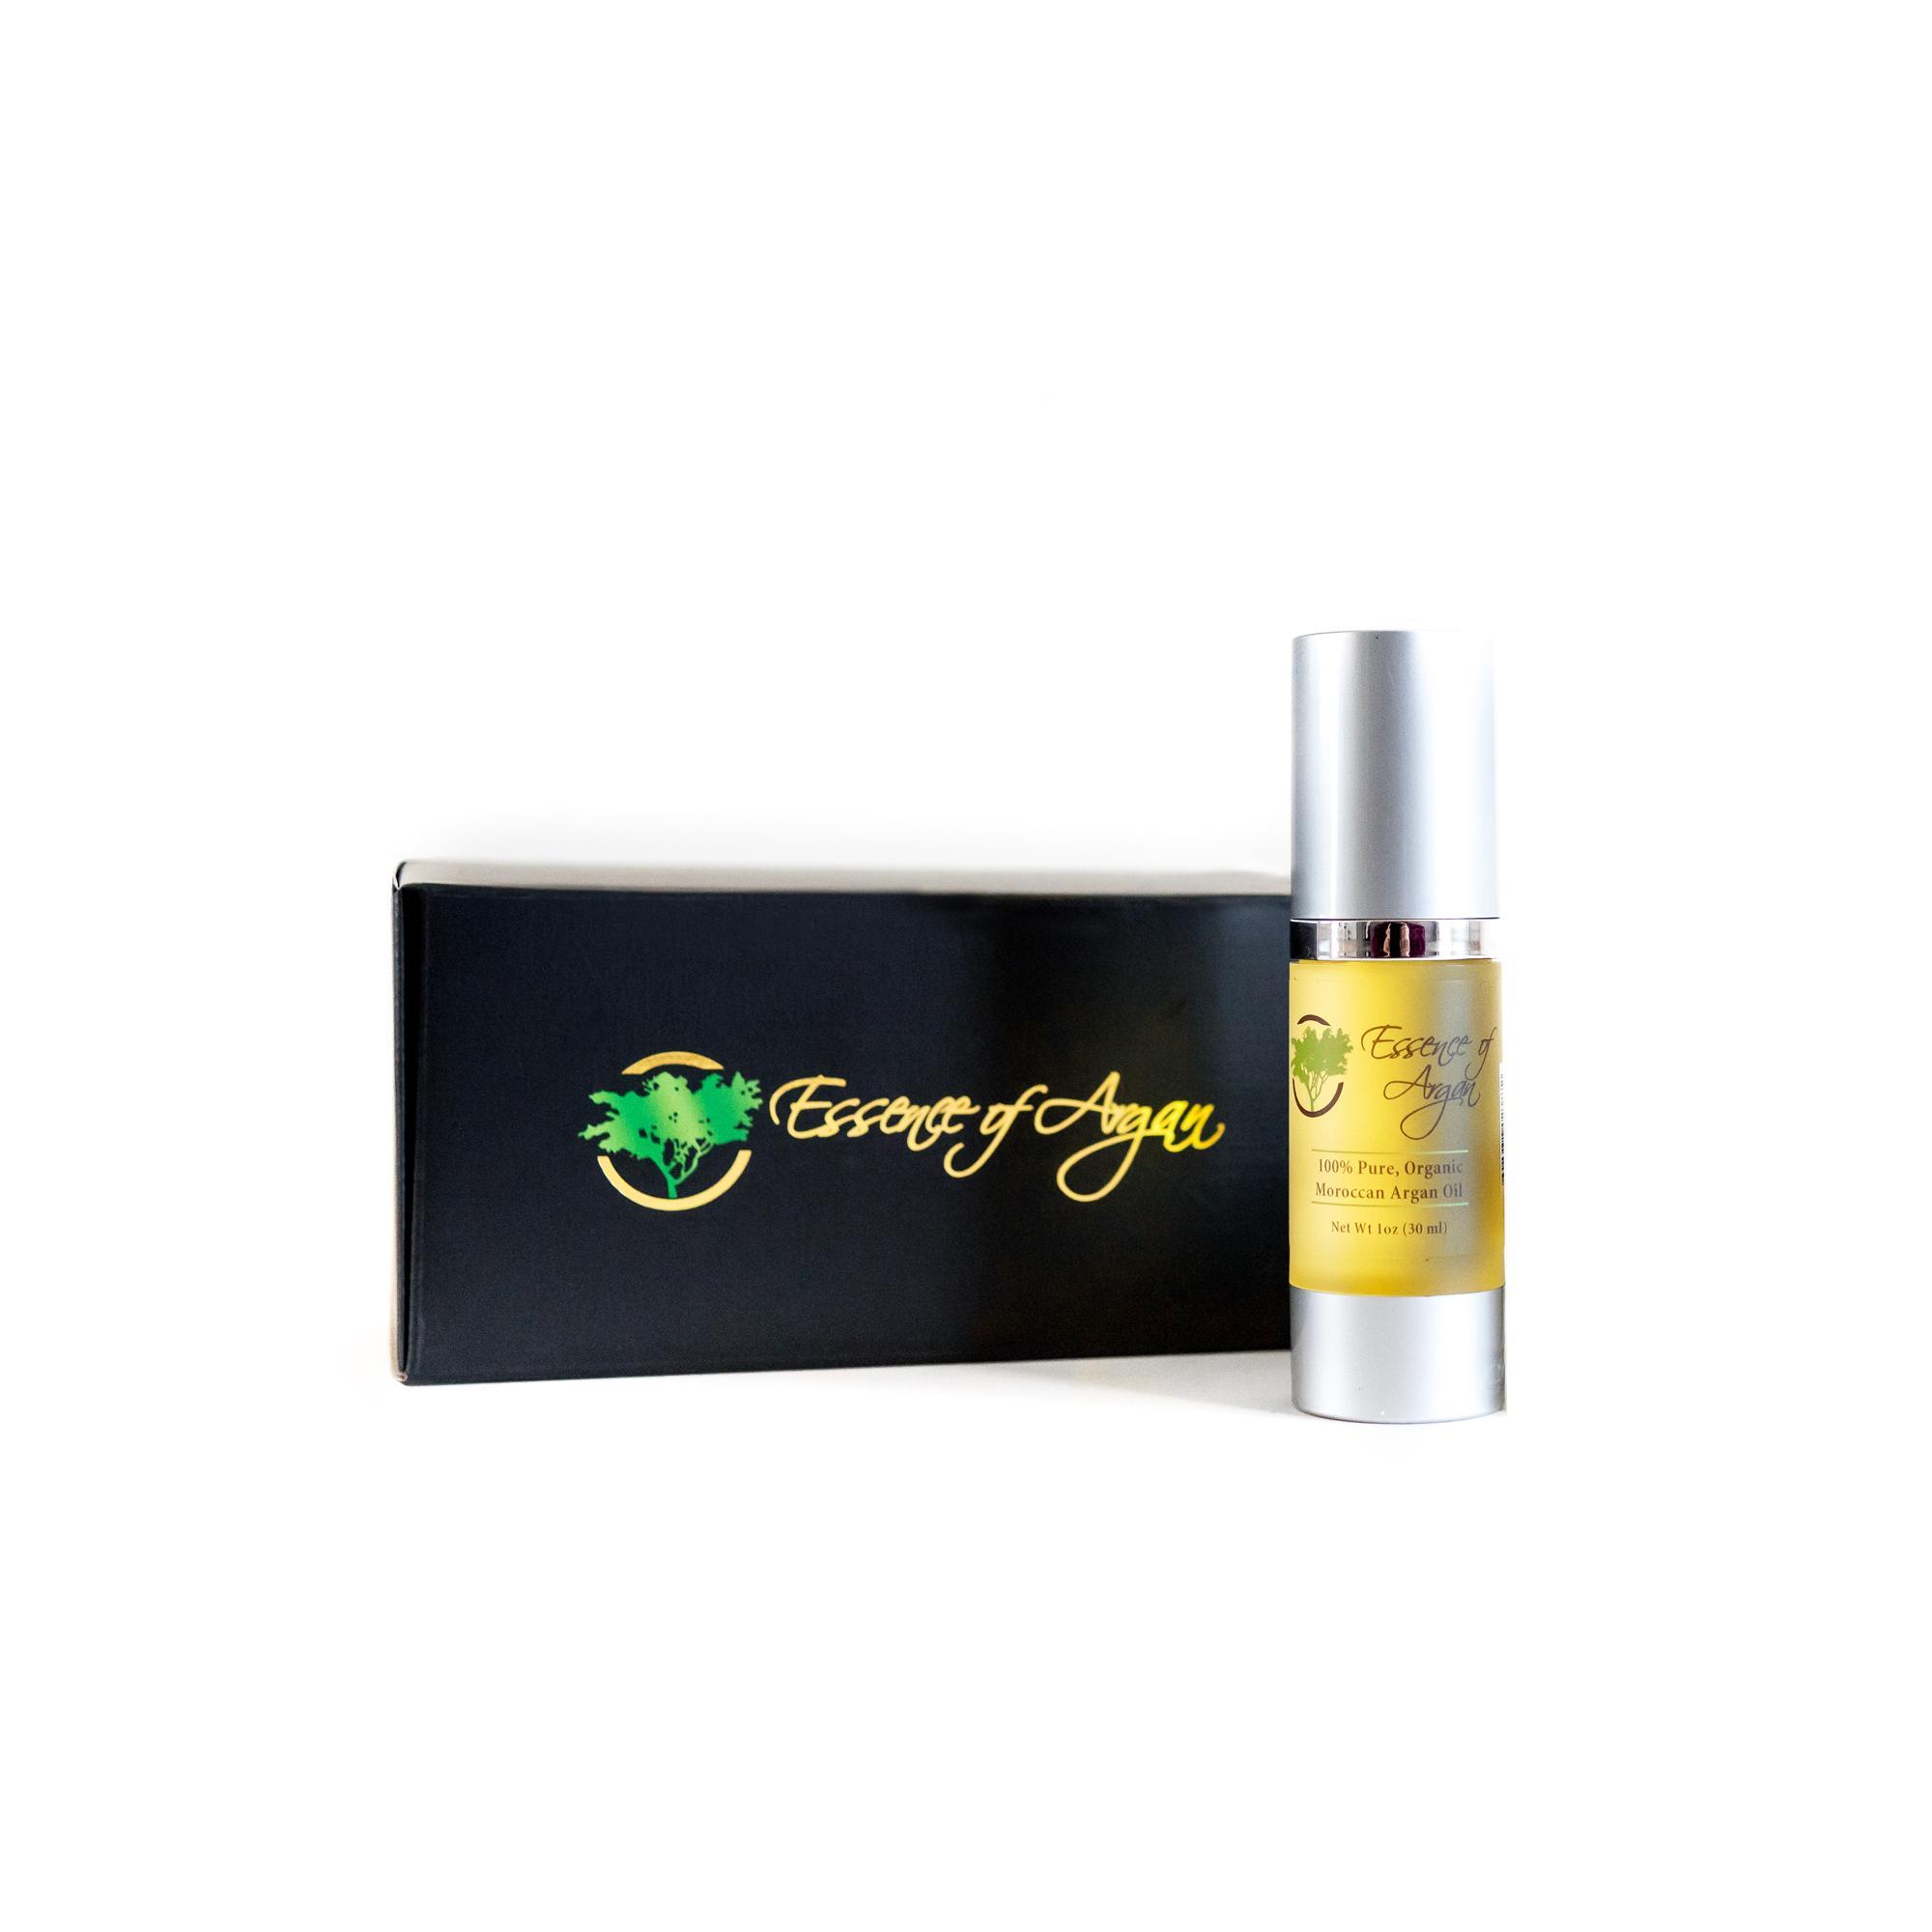 Essence of Argan Beauty Subscription Box: Starter Box